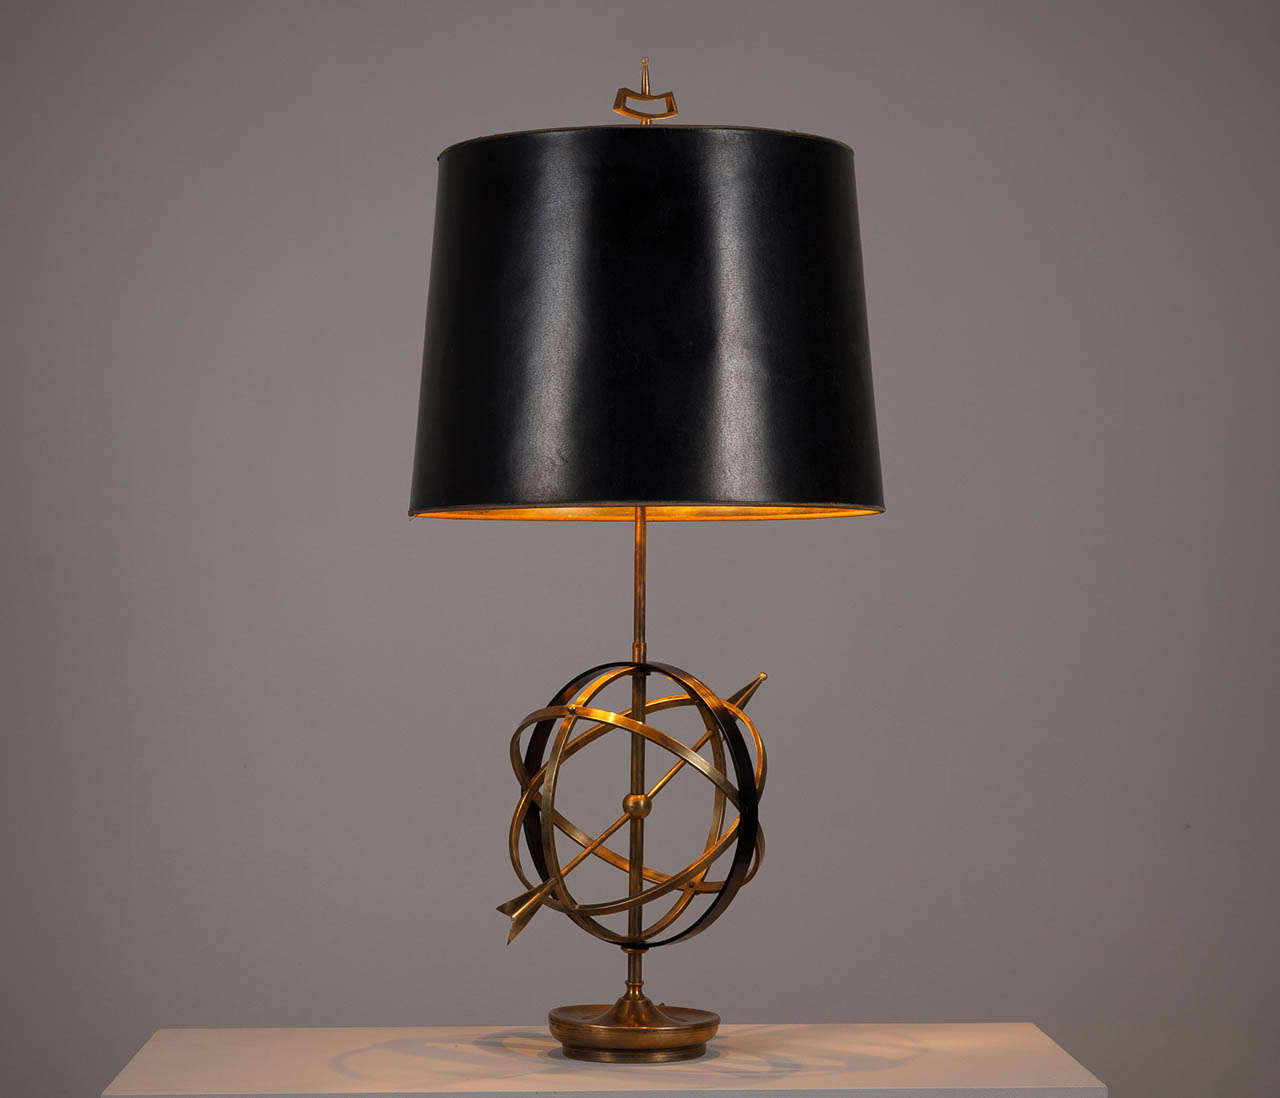 solid brass 39 sundial 39 table lamp for sale at 1stdibs. Black Bedroom Furniture Sets. Home Design Ideas